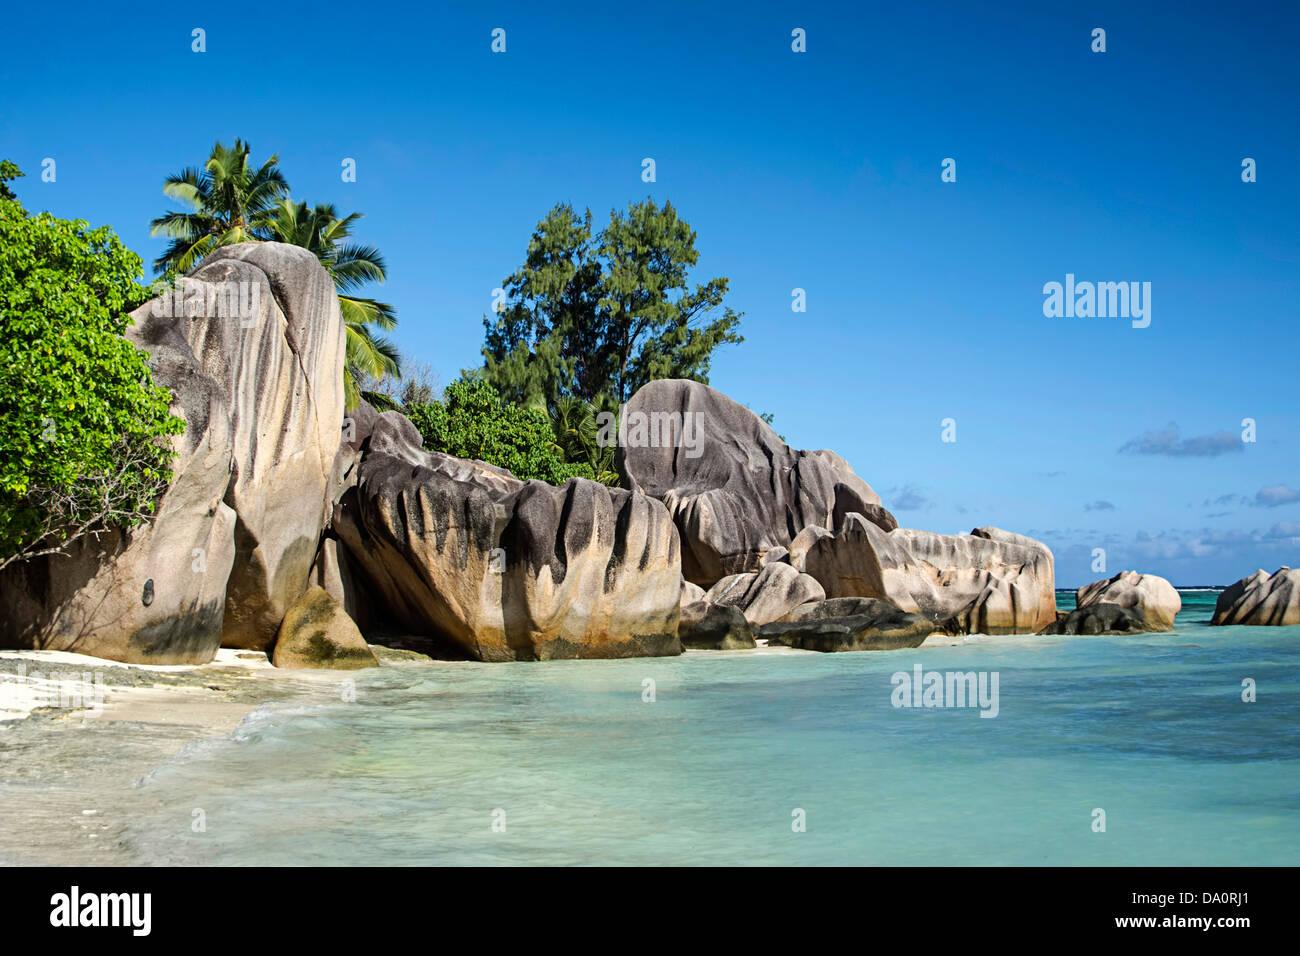 Anse Source D'Argent, La Digue, Seychelles, Indian Ocean, Africa - Stock Image